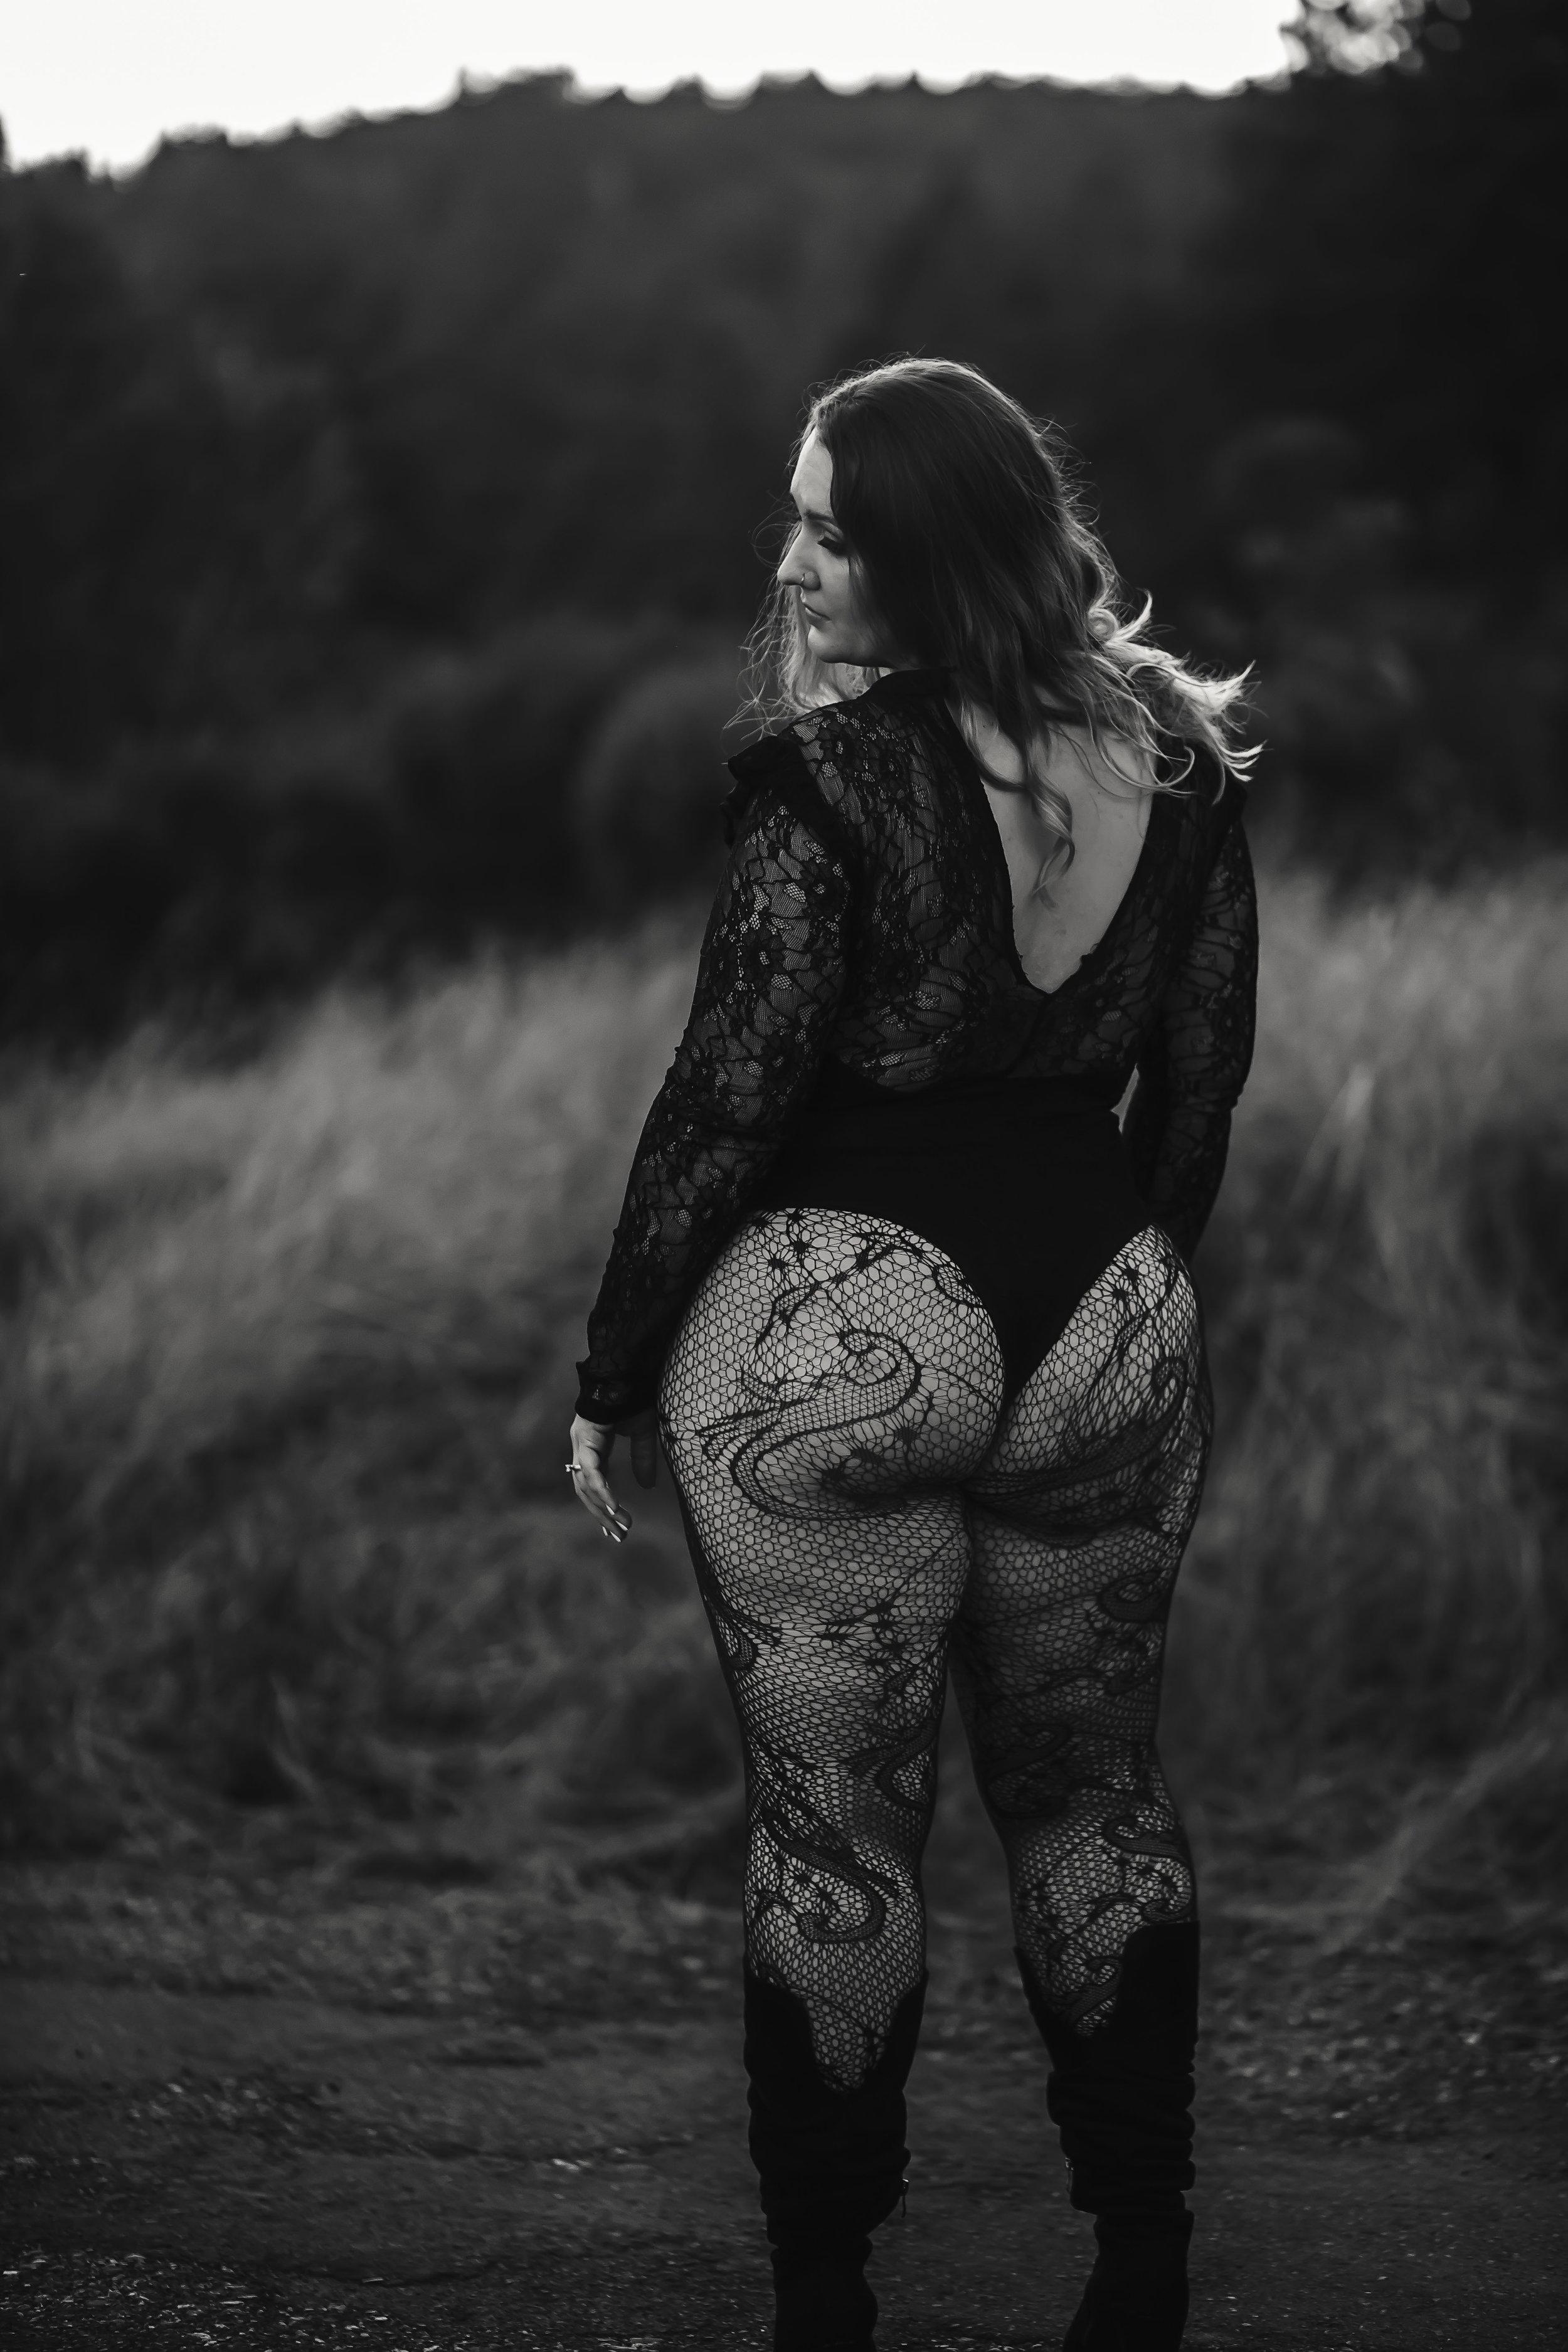 Sonoma County photography | Bridal Boudoir | Outdoor Boudoir | Napa, Ca | Sonoma County, Ca | Santa Rosa, Ca | Wine Country photographer | Petaluma, Ca